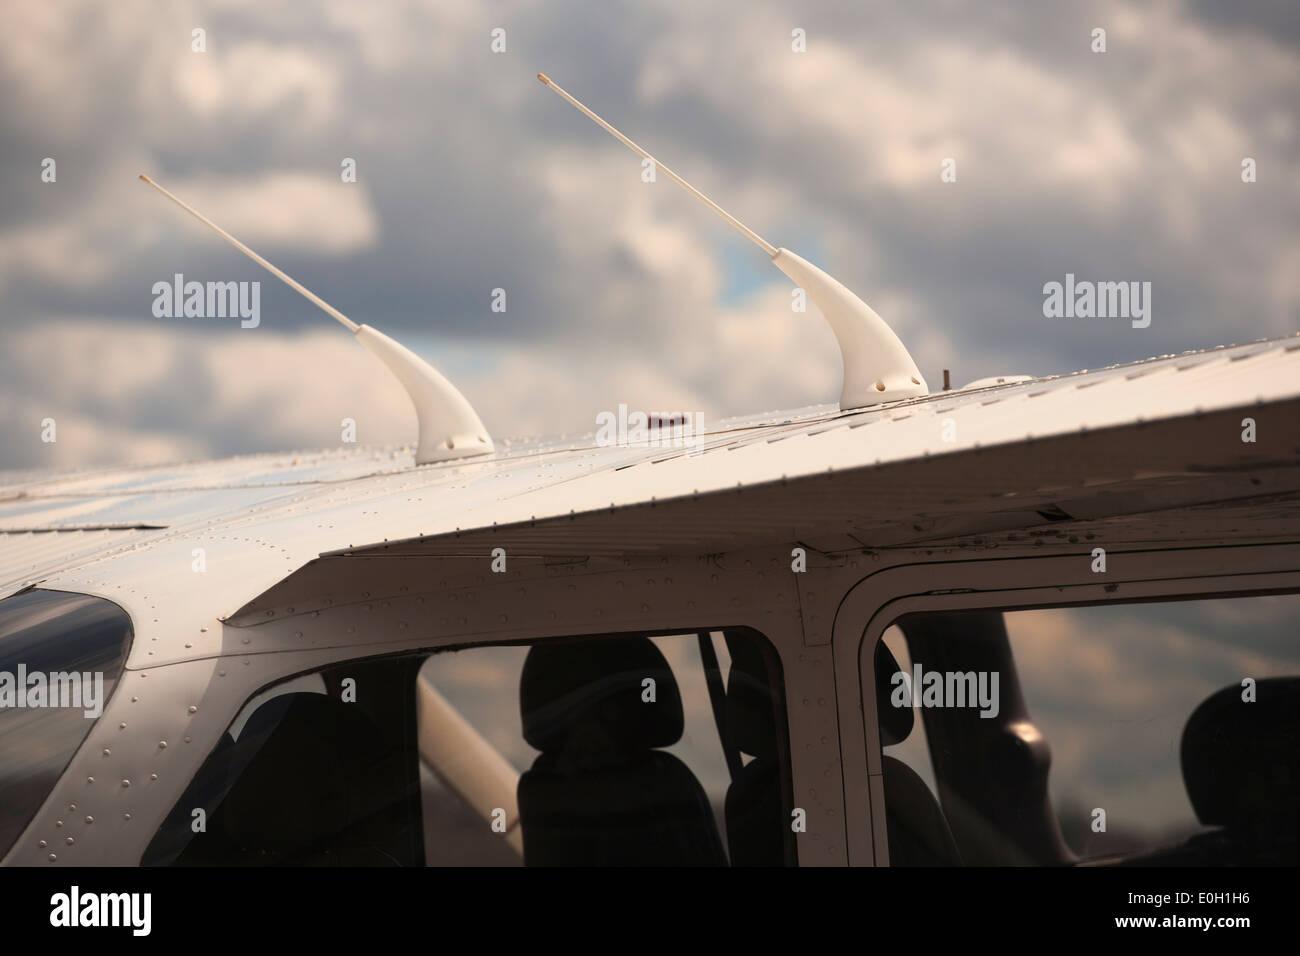 Cessna 172 VHF antennas on wing - Stock Image